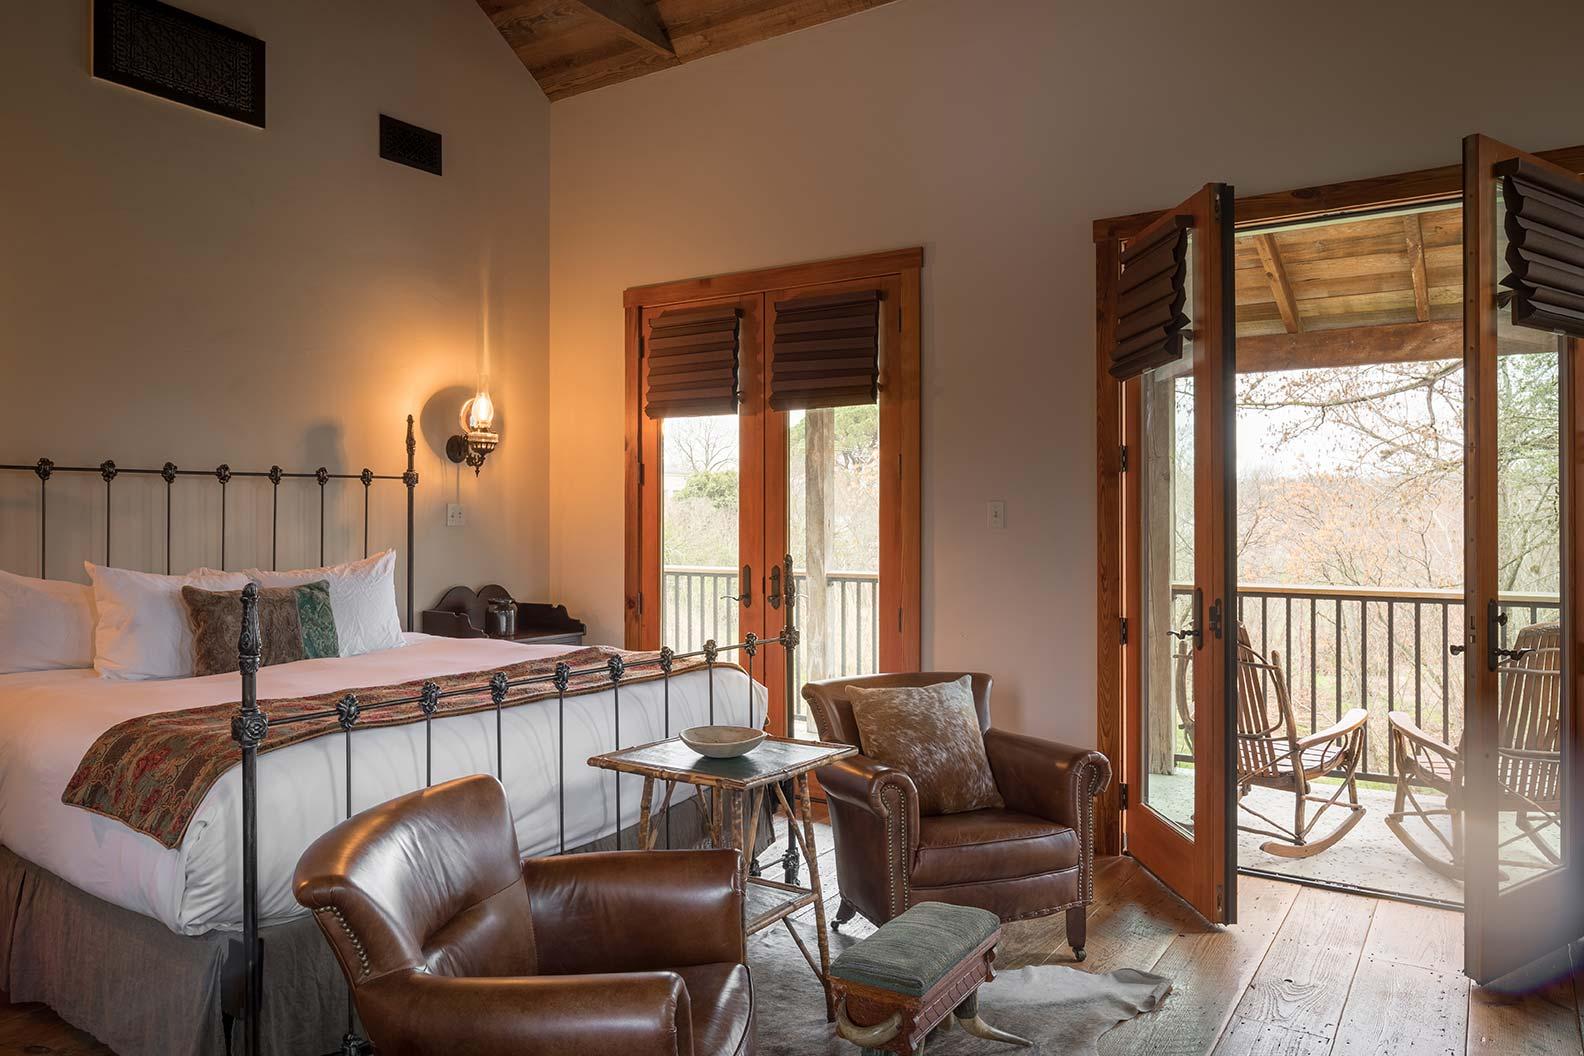 blacksmith-quarters-fredericksburg-realty-texas-commercial-real-estate-for-sale-investment-tourism.jpg